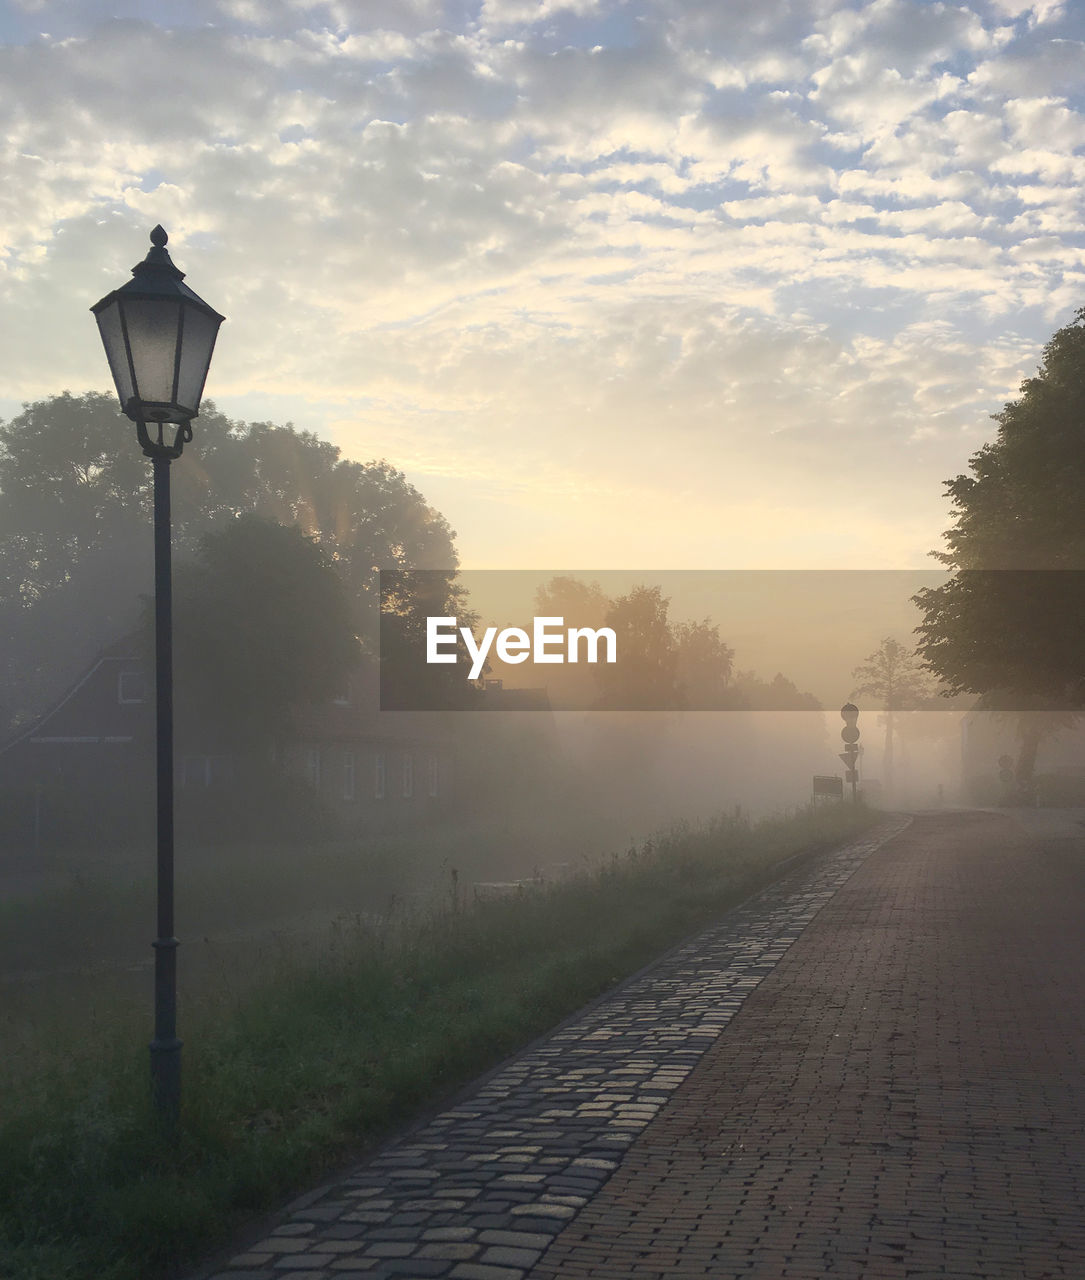 STREET LIGHT BY FOOTPATH AGAINST SKY